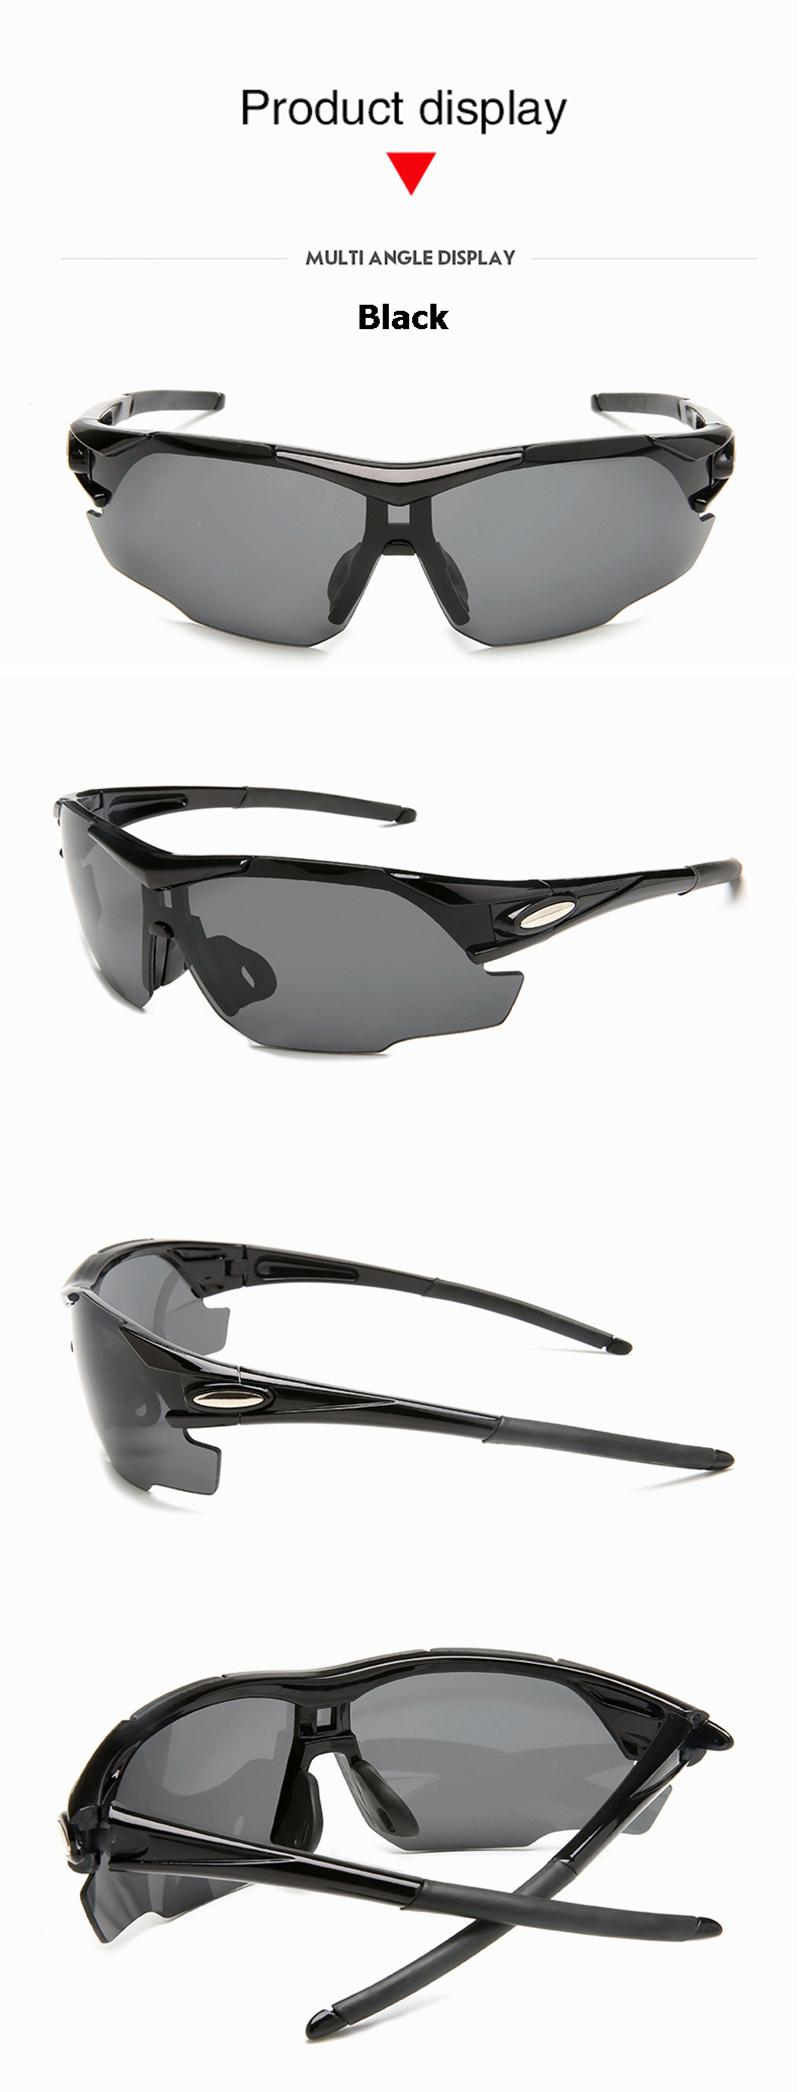 Anti-UV Cycling Men Women Glasses Bike Bicycle Glasses Outdoor Sports MTB Sunglasses Goggles Eyewear Myopia Frame AC0171 (8)